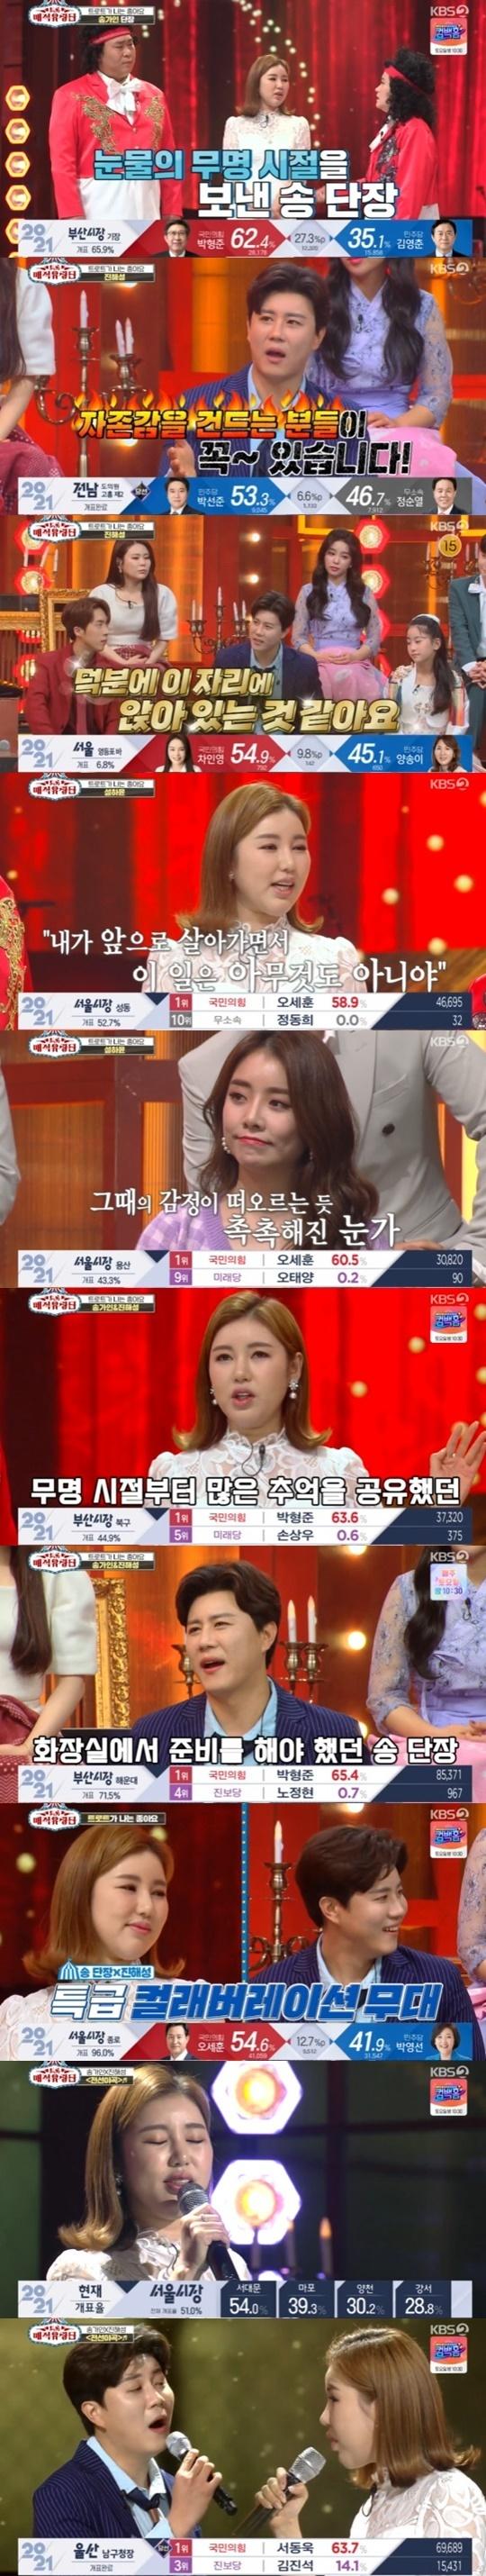 KBS 2TV '트롯 매직유랑단' © 뉴스1